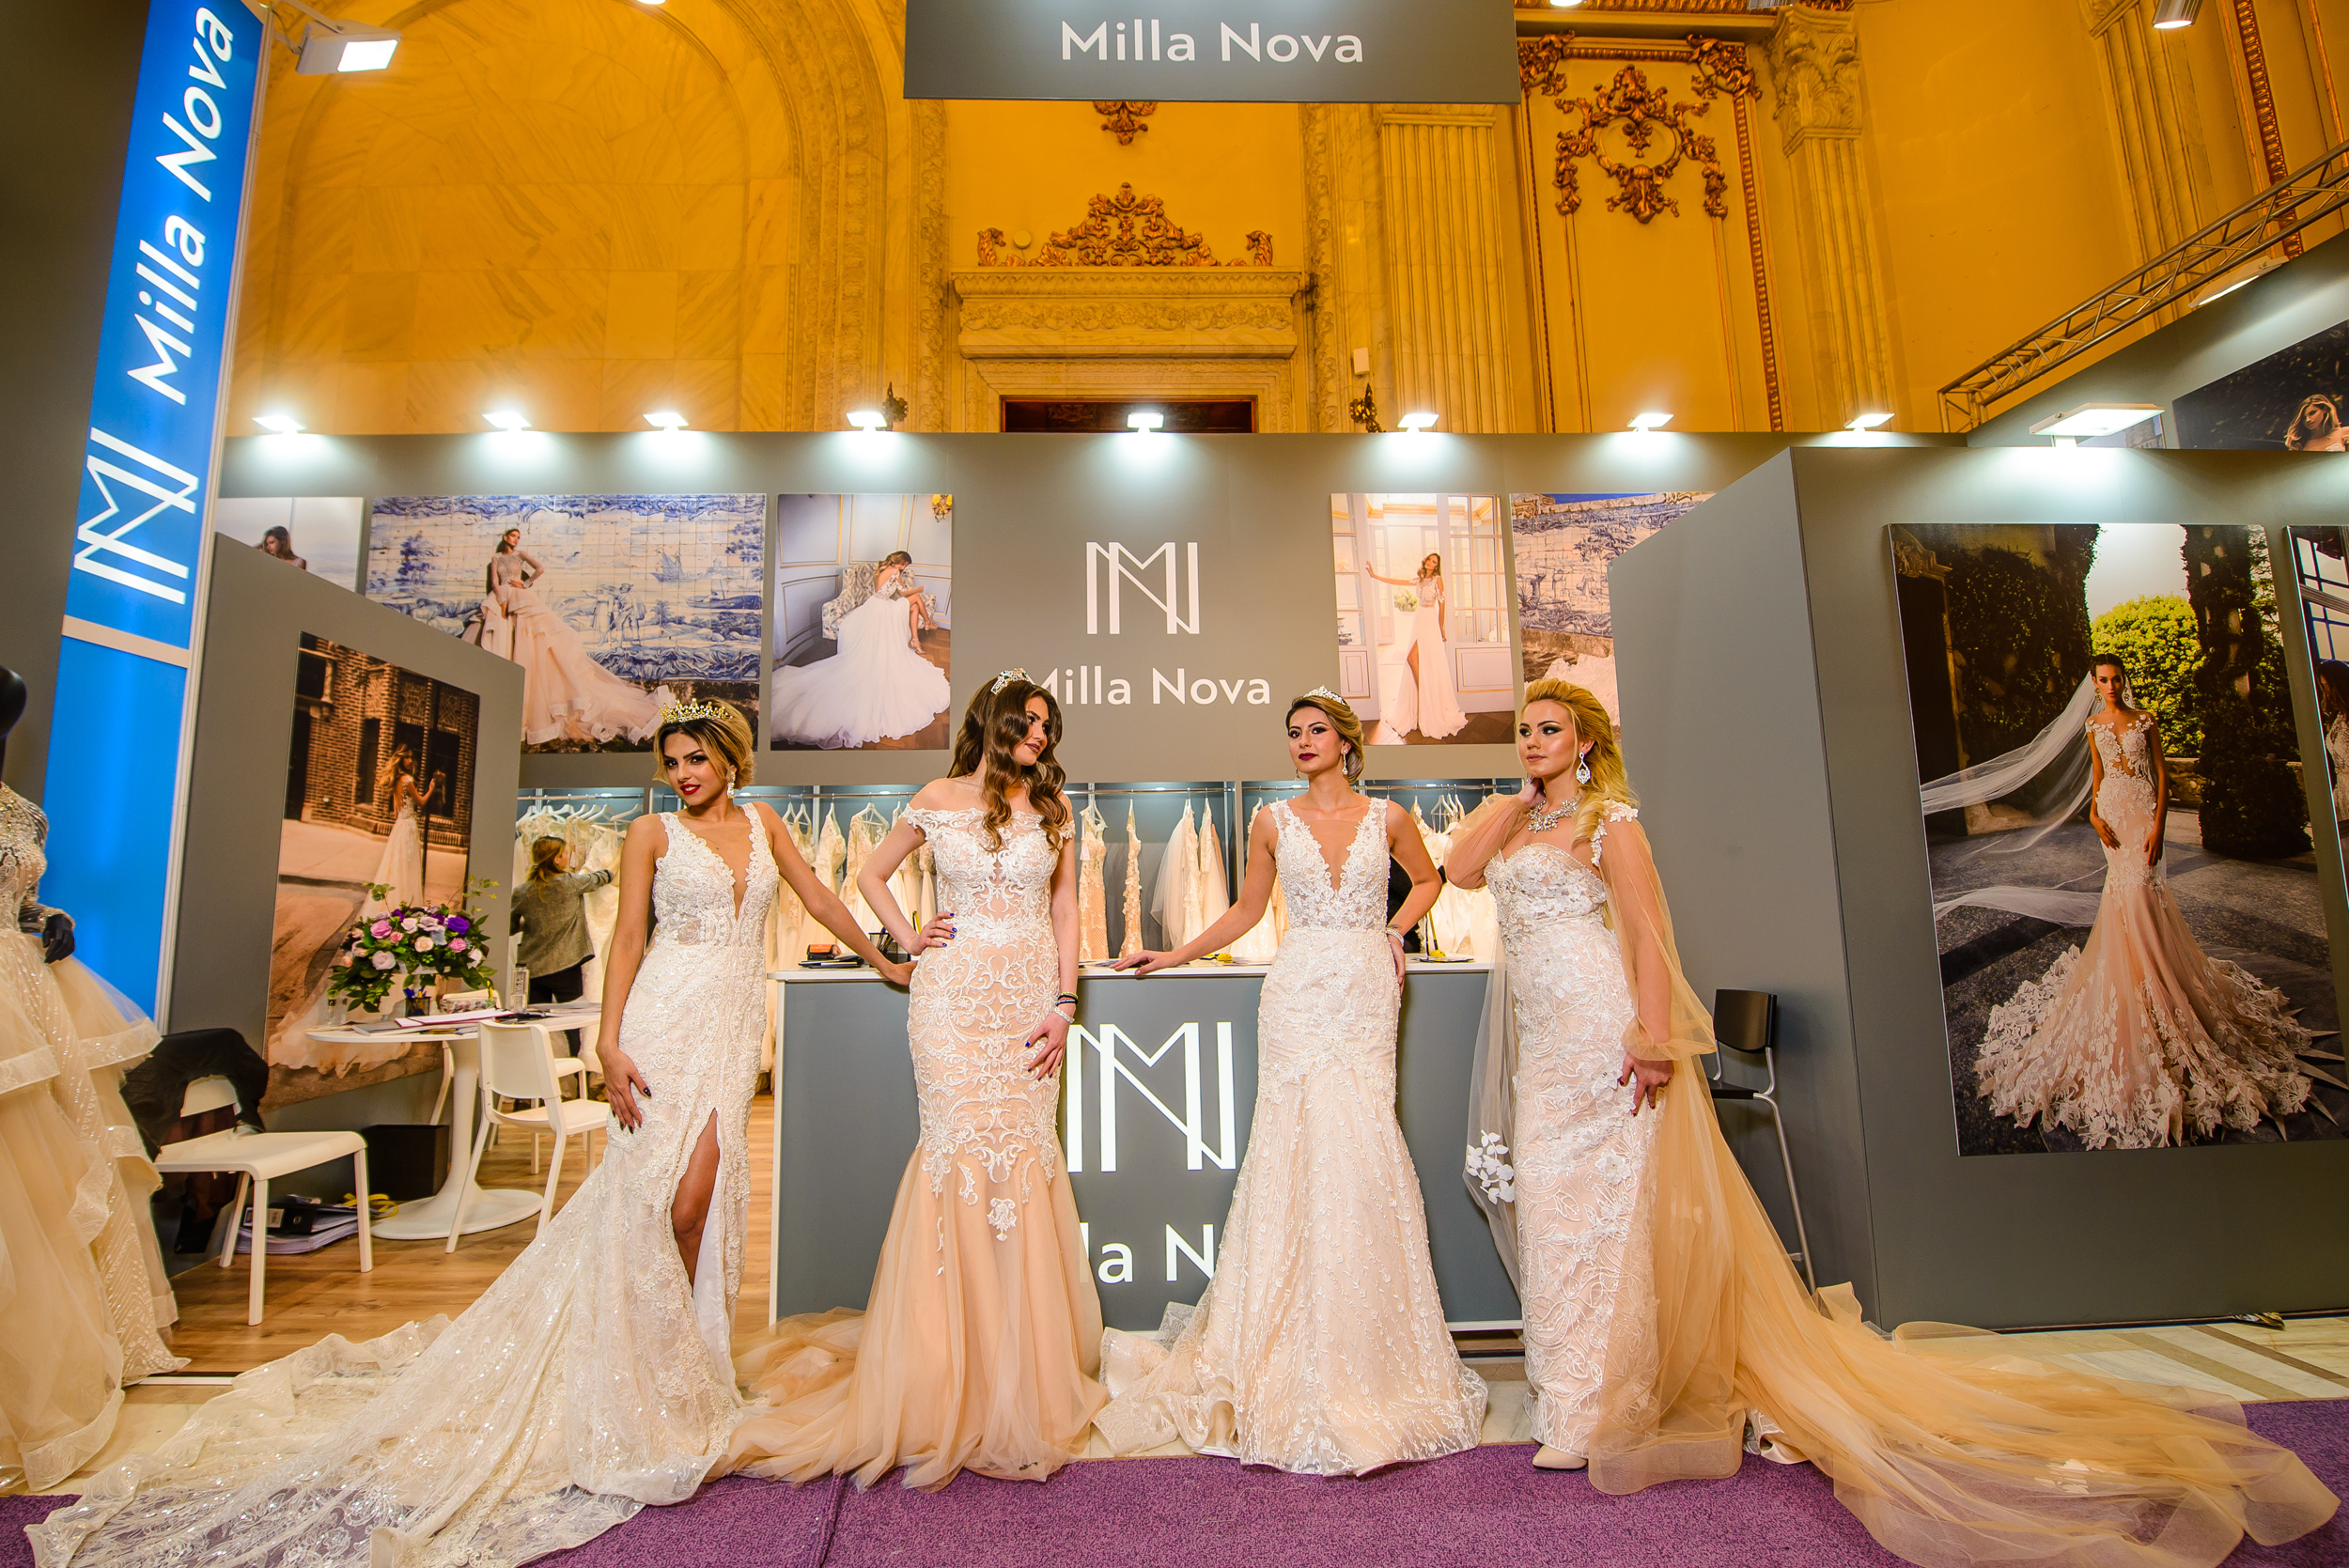 Targ de nunti - Mariage Fest - rochii de mireasa Bucuresti